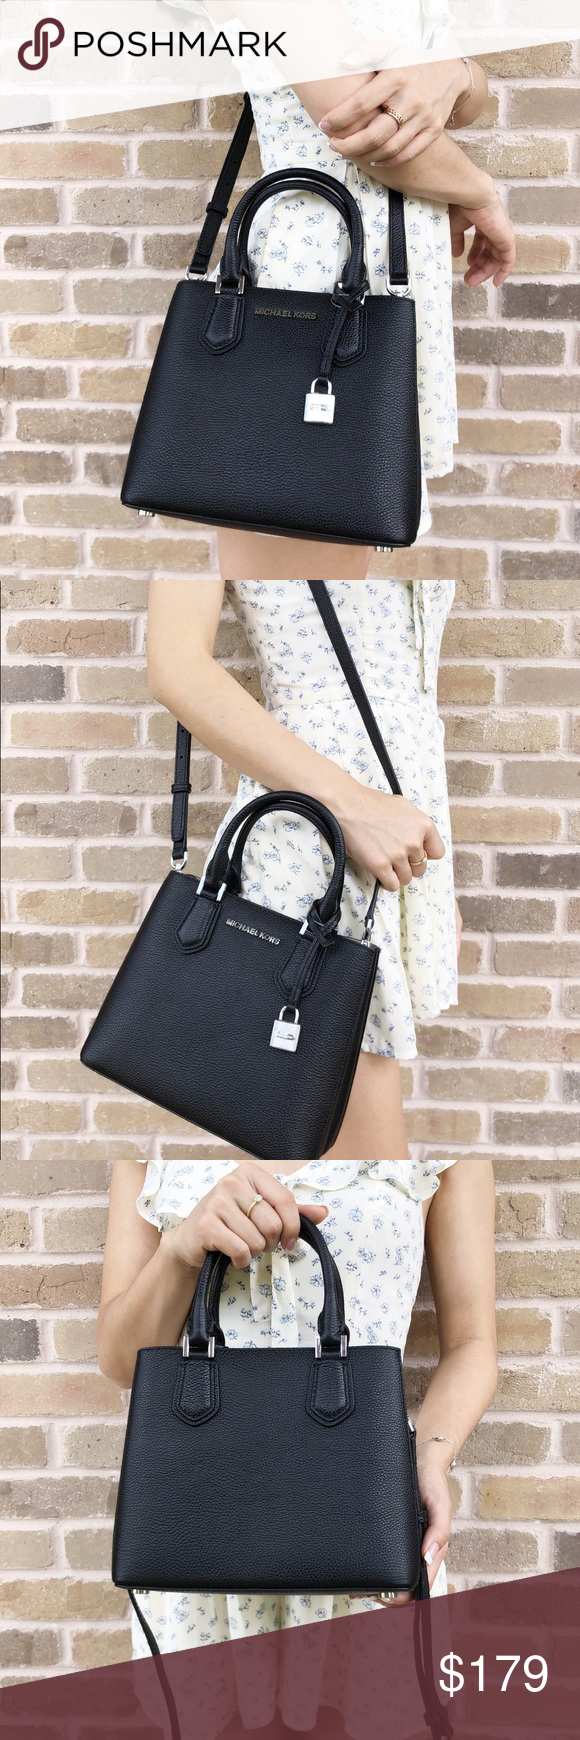 5db7eca987d9 Michael Kors Adele Mercer Medium Messenger Bag STYLE: 35T8SGAFS3L Color: Black  Pebbled Leather exterior